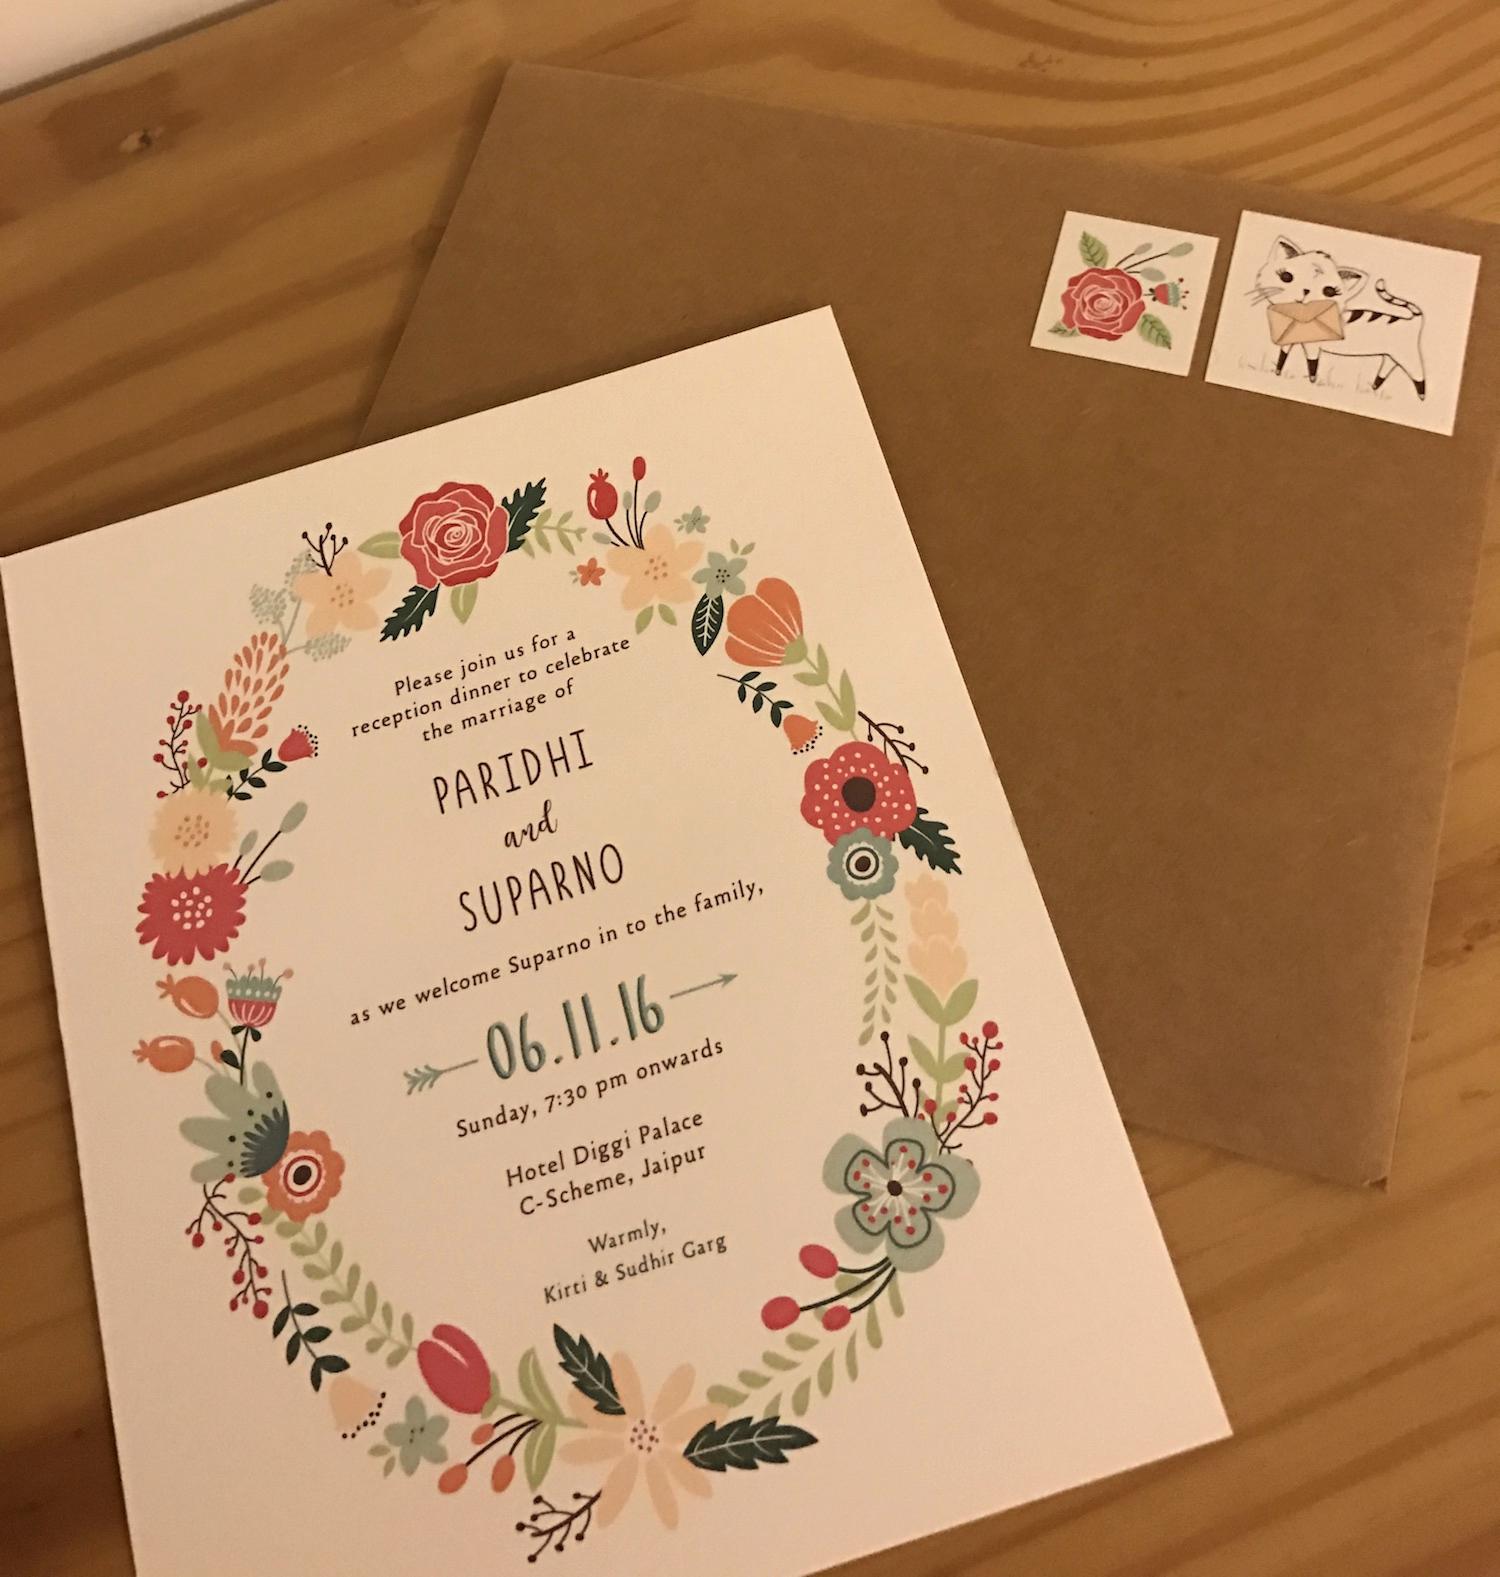 Wedding Invitation Design Ideas New 20 Unique & Creative Wedding Invitation Ideas for Your